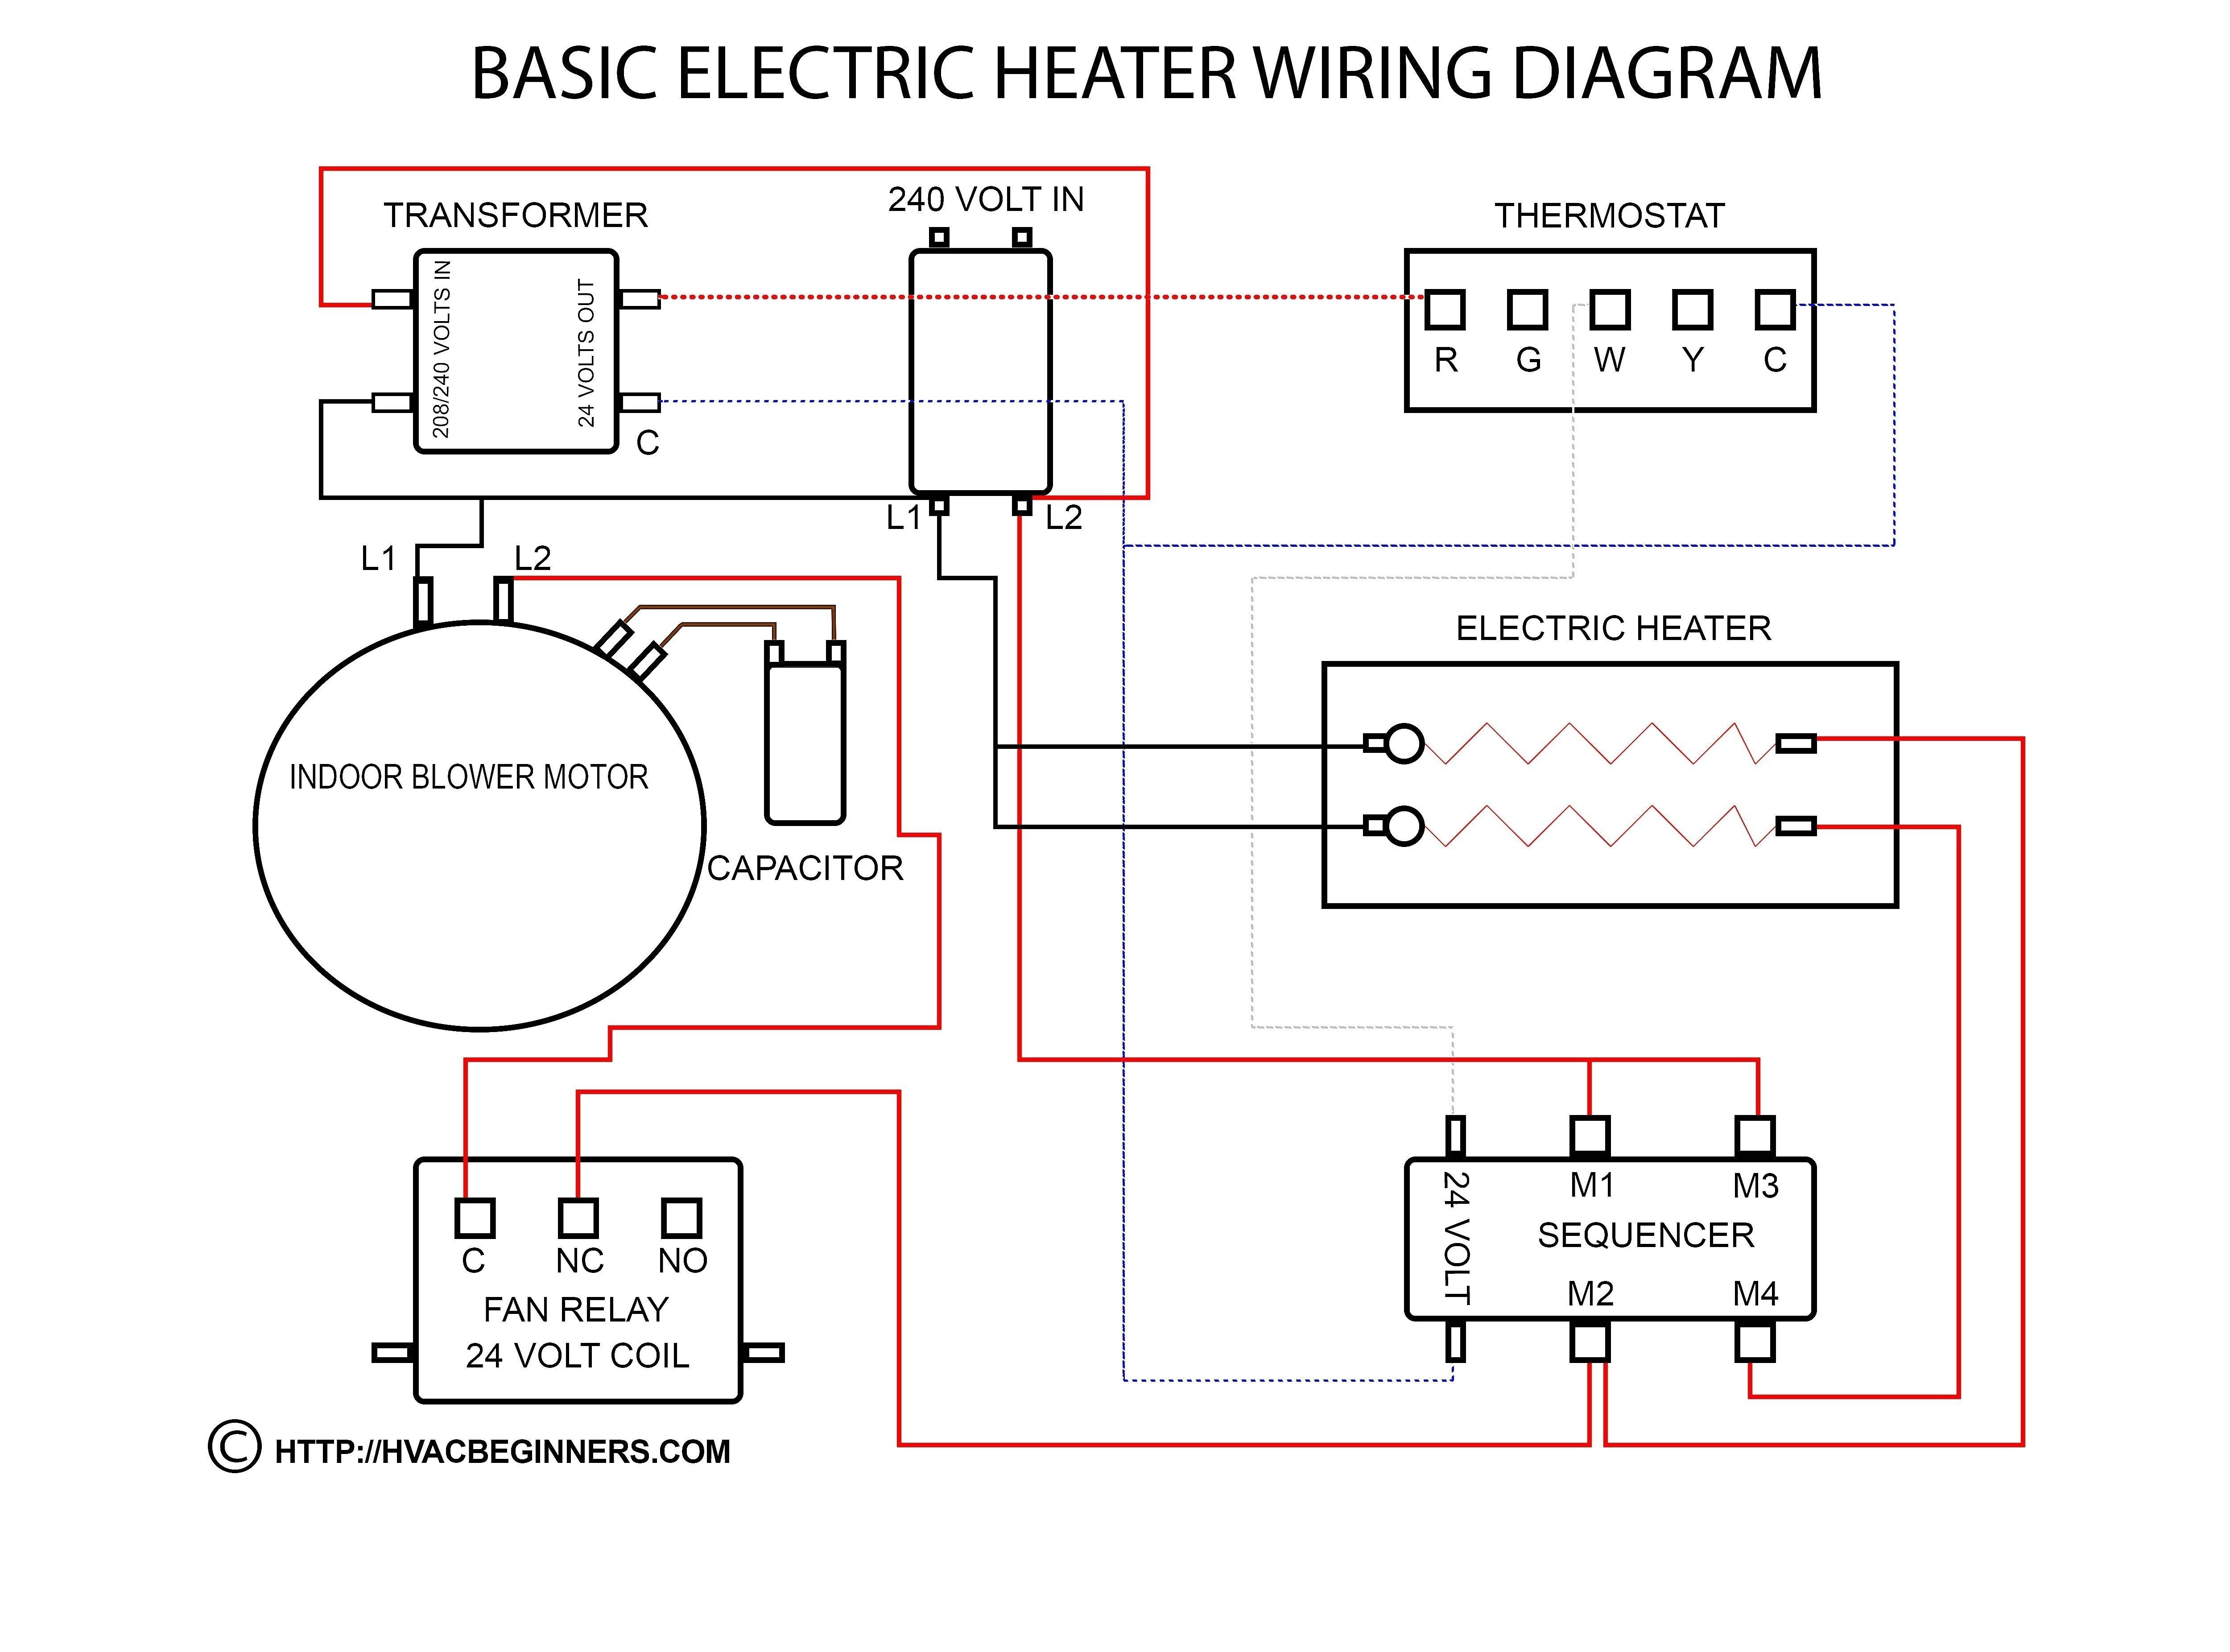 Af 4491 House Wiring Diagram Book